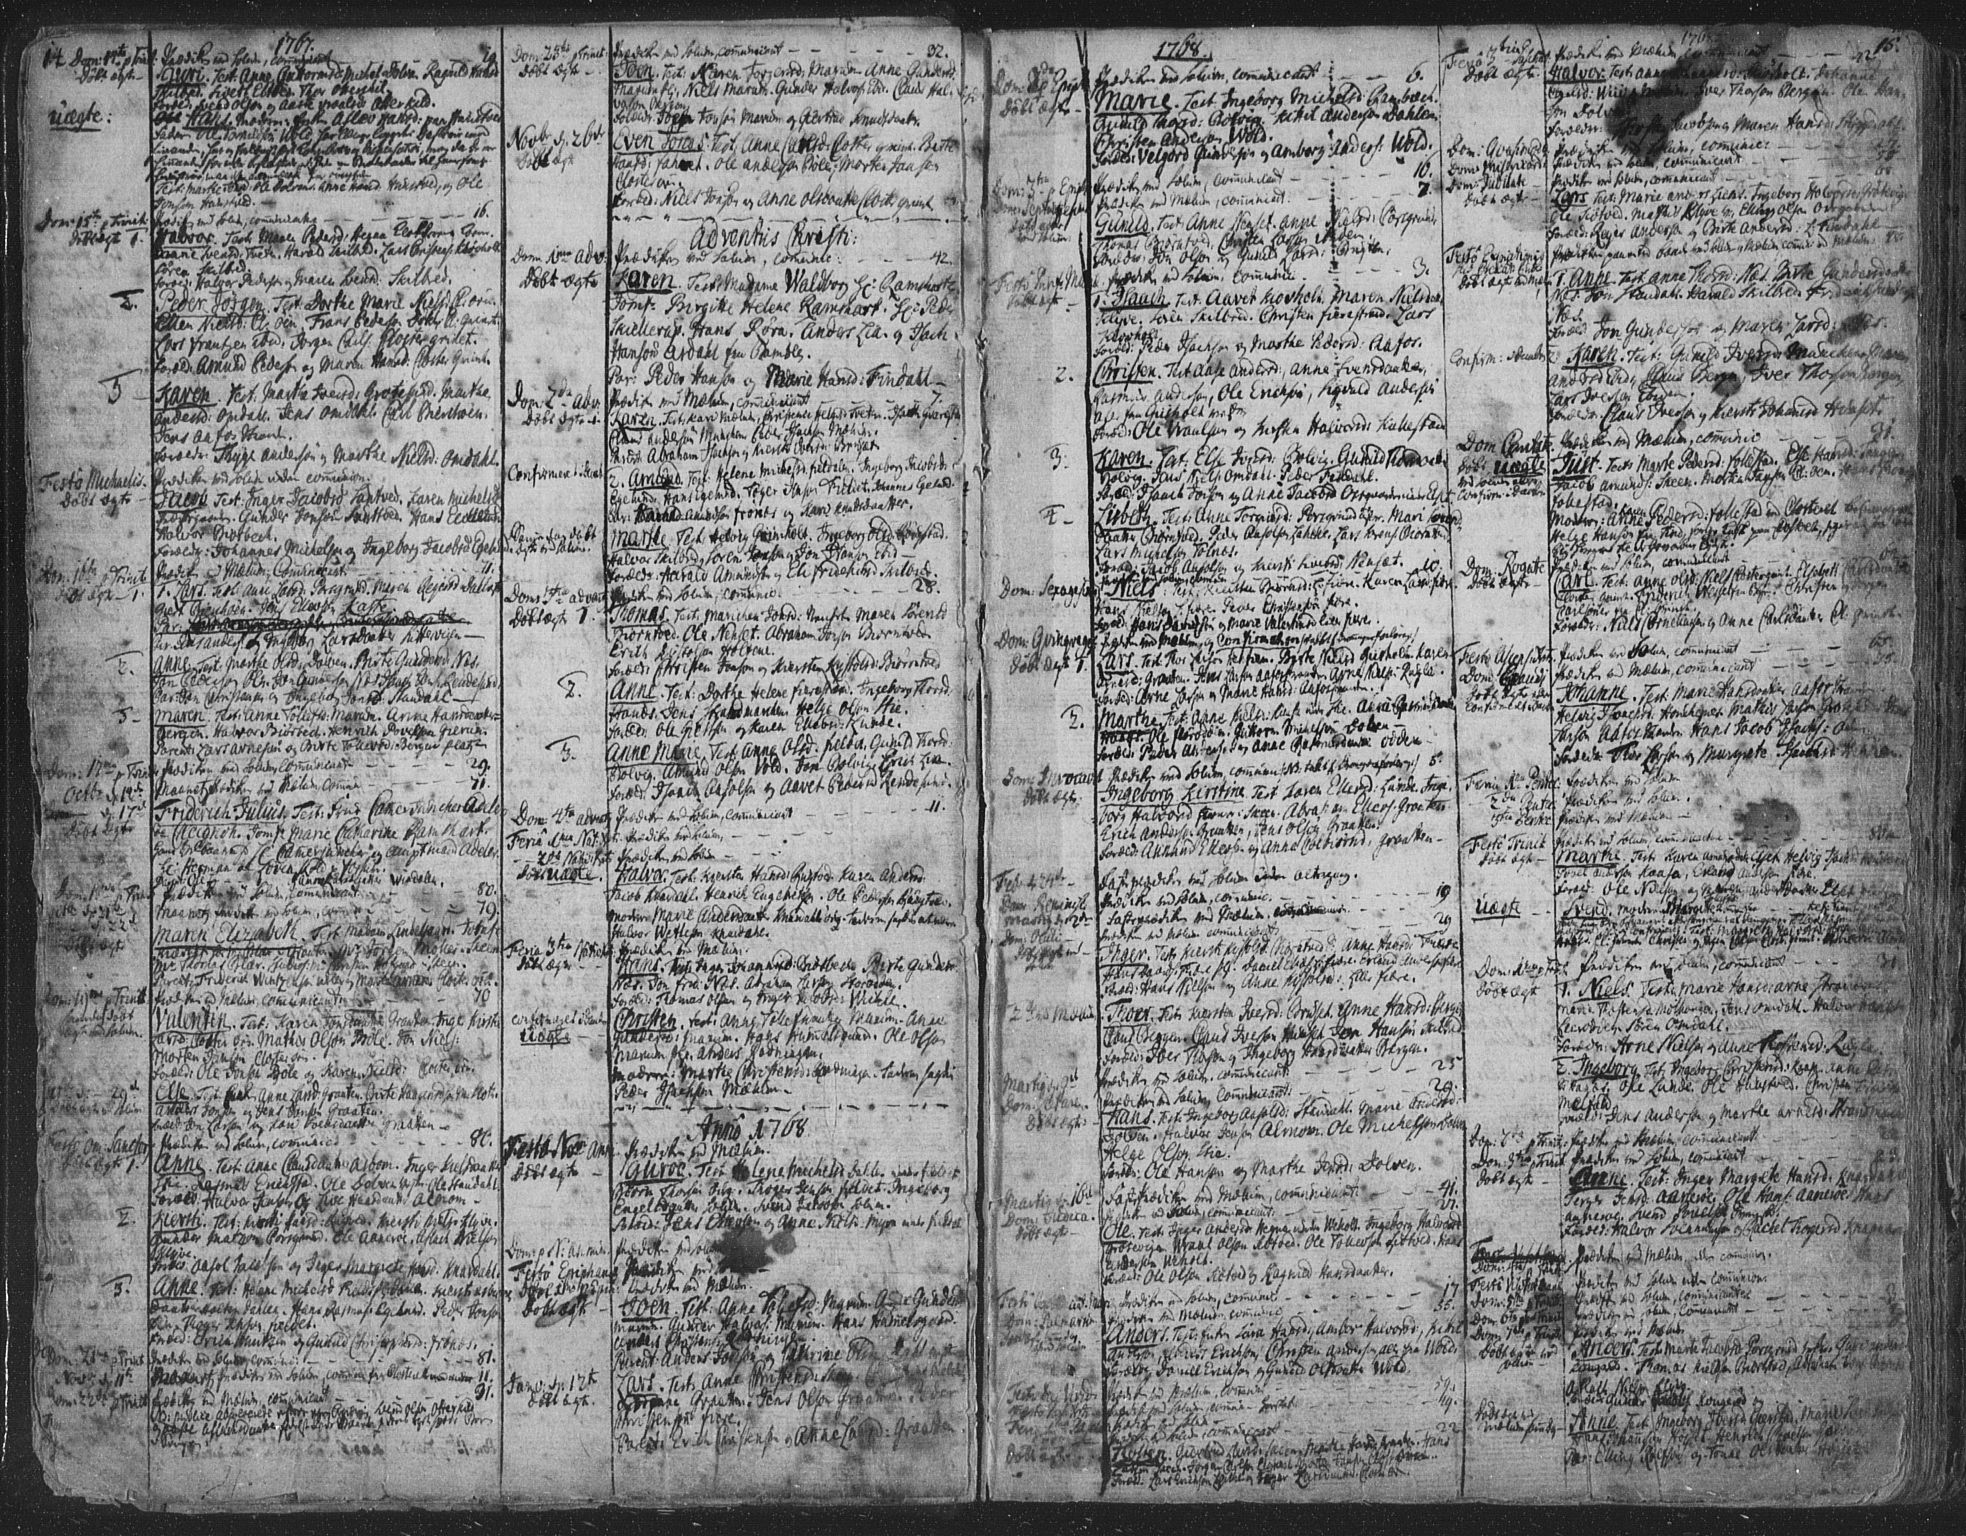 SAKO, Solum kirkebøker, F/Fa/L0003: Ministerialbok nr. I 3, 1761-1814, s. 14-15